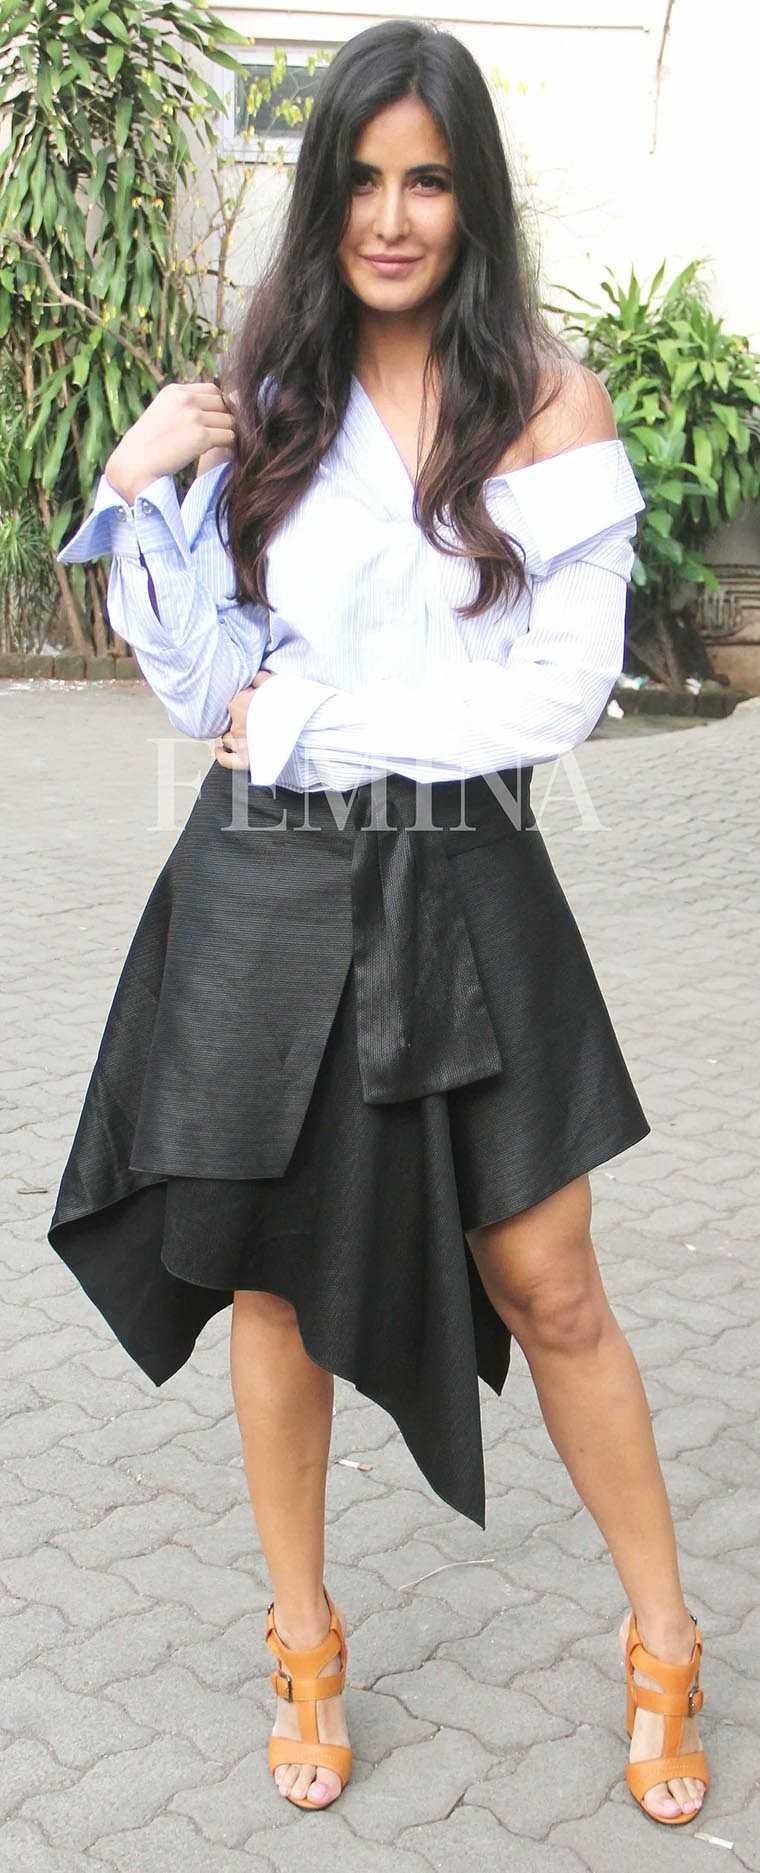 Katrina Kaif deconstructed Proenza Schouler skirt